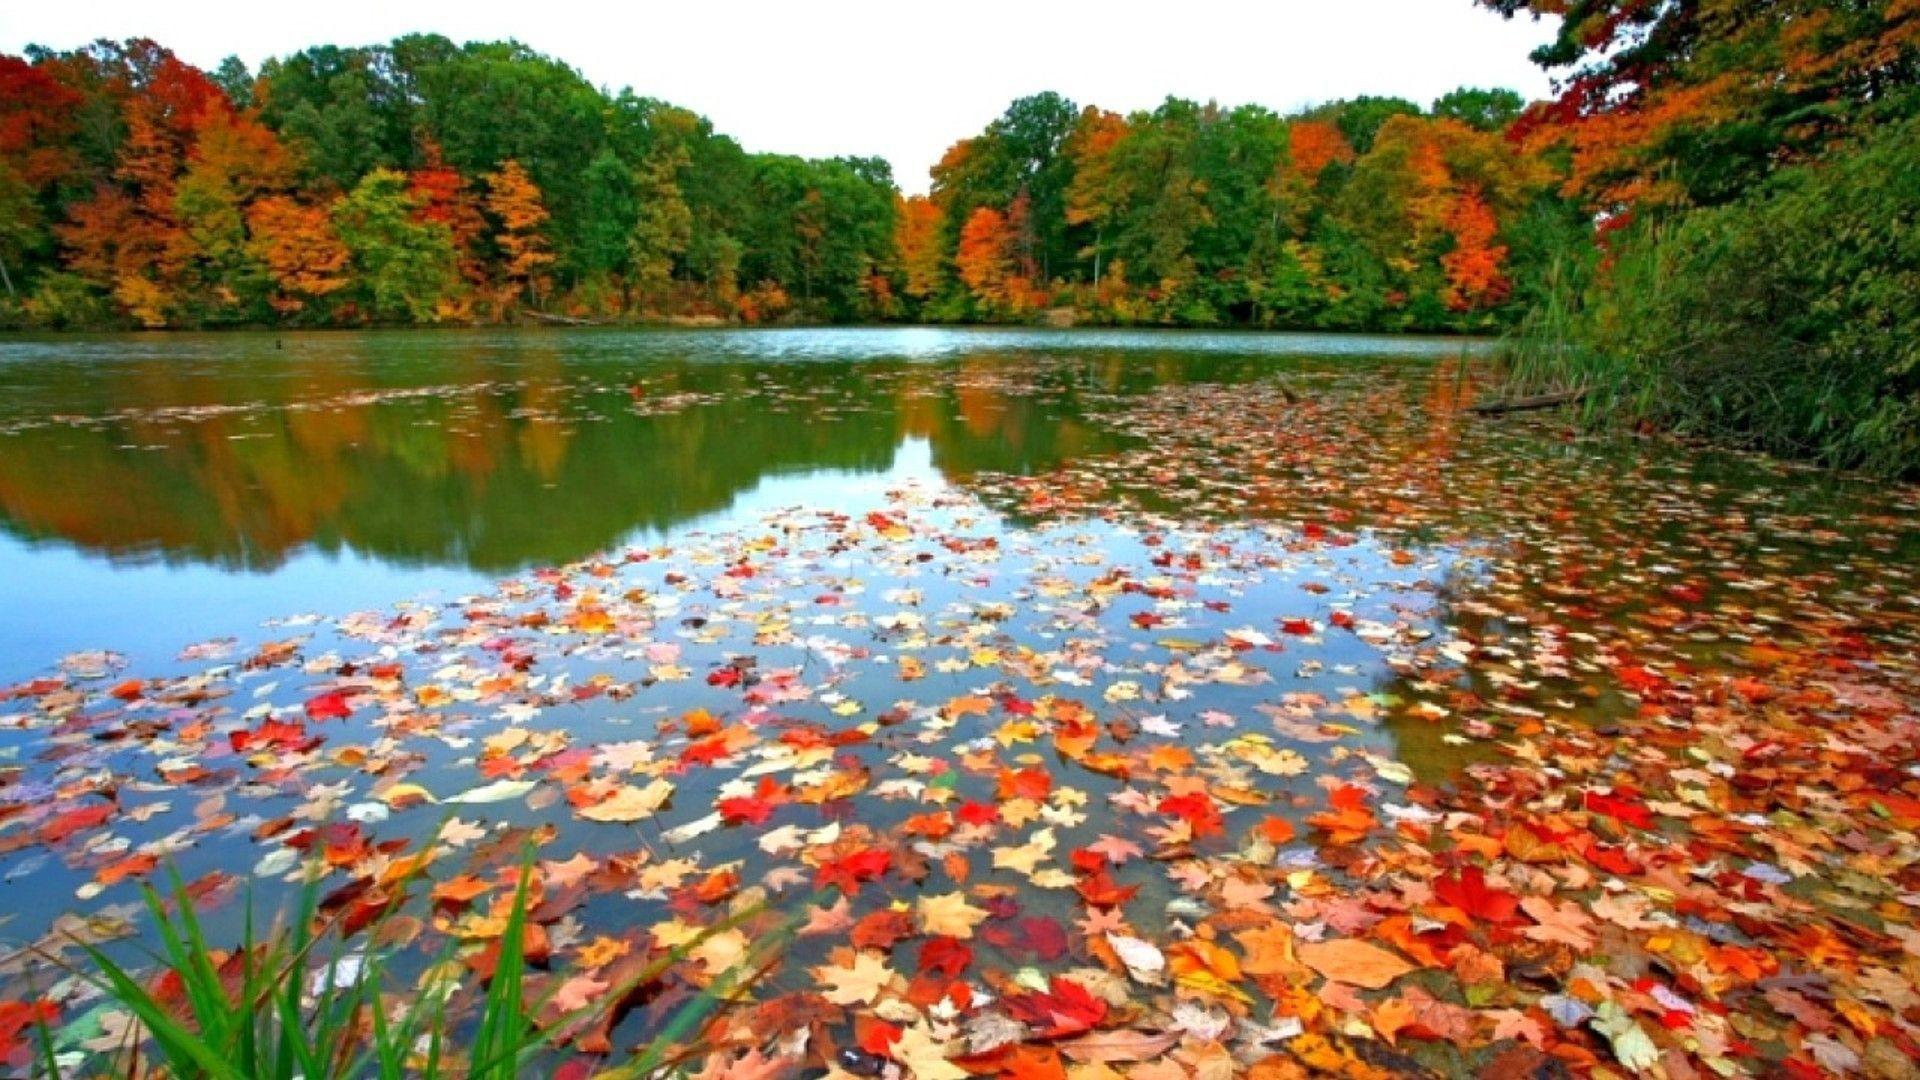 Autumn Wallpapers for Desktop (68+ images)